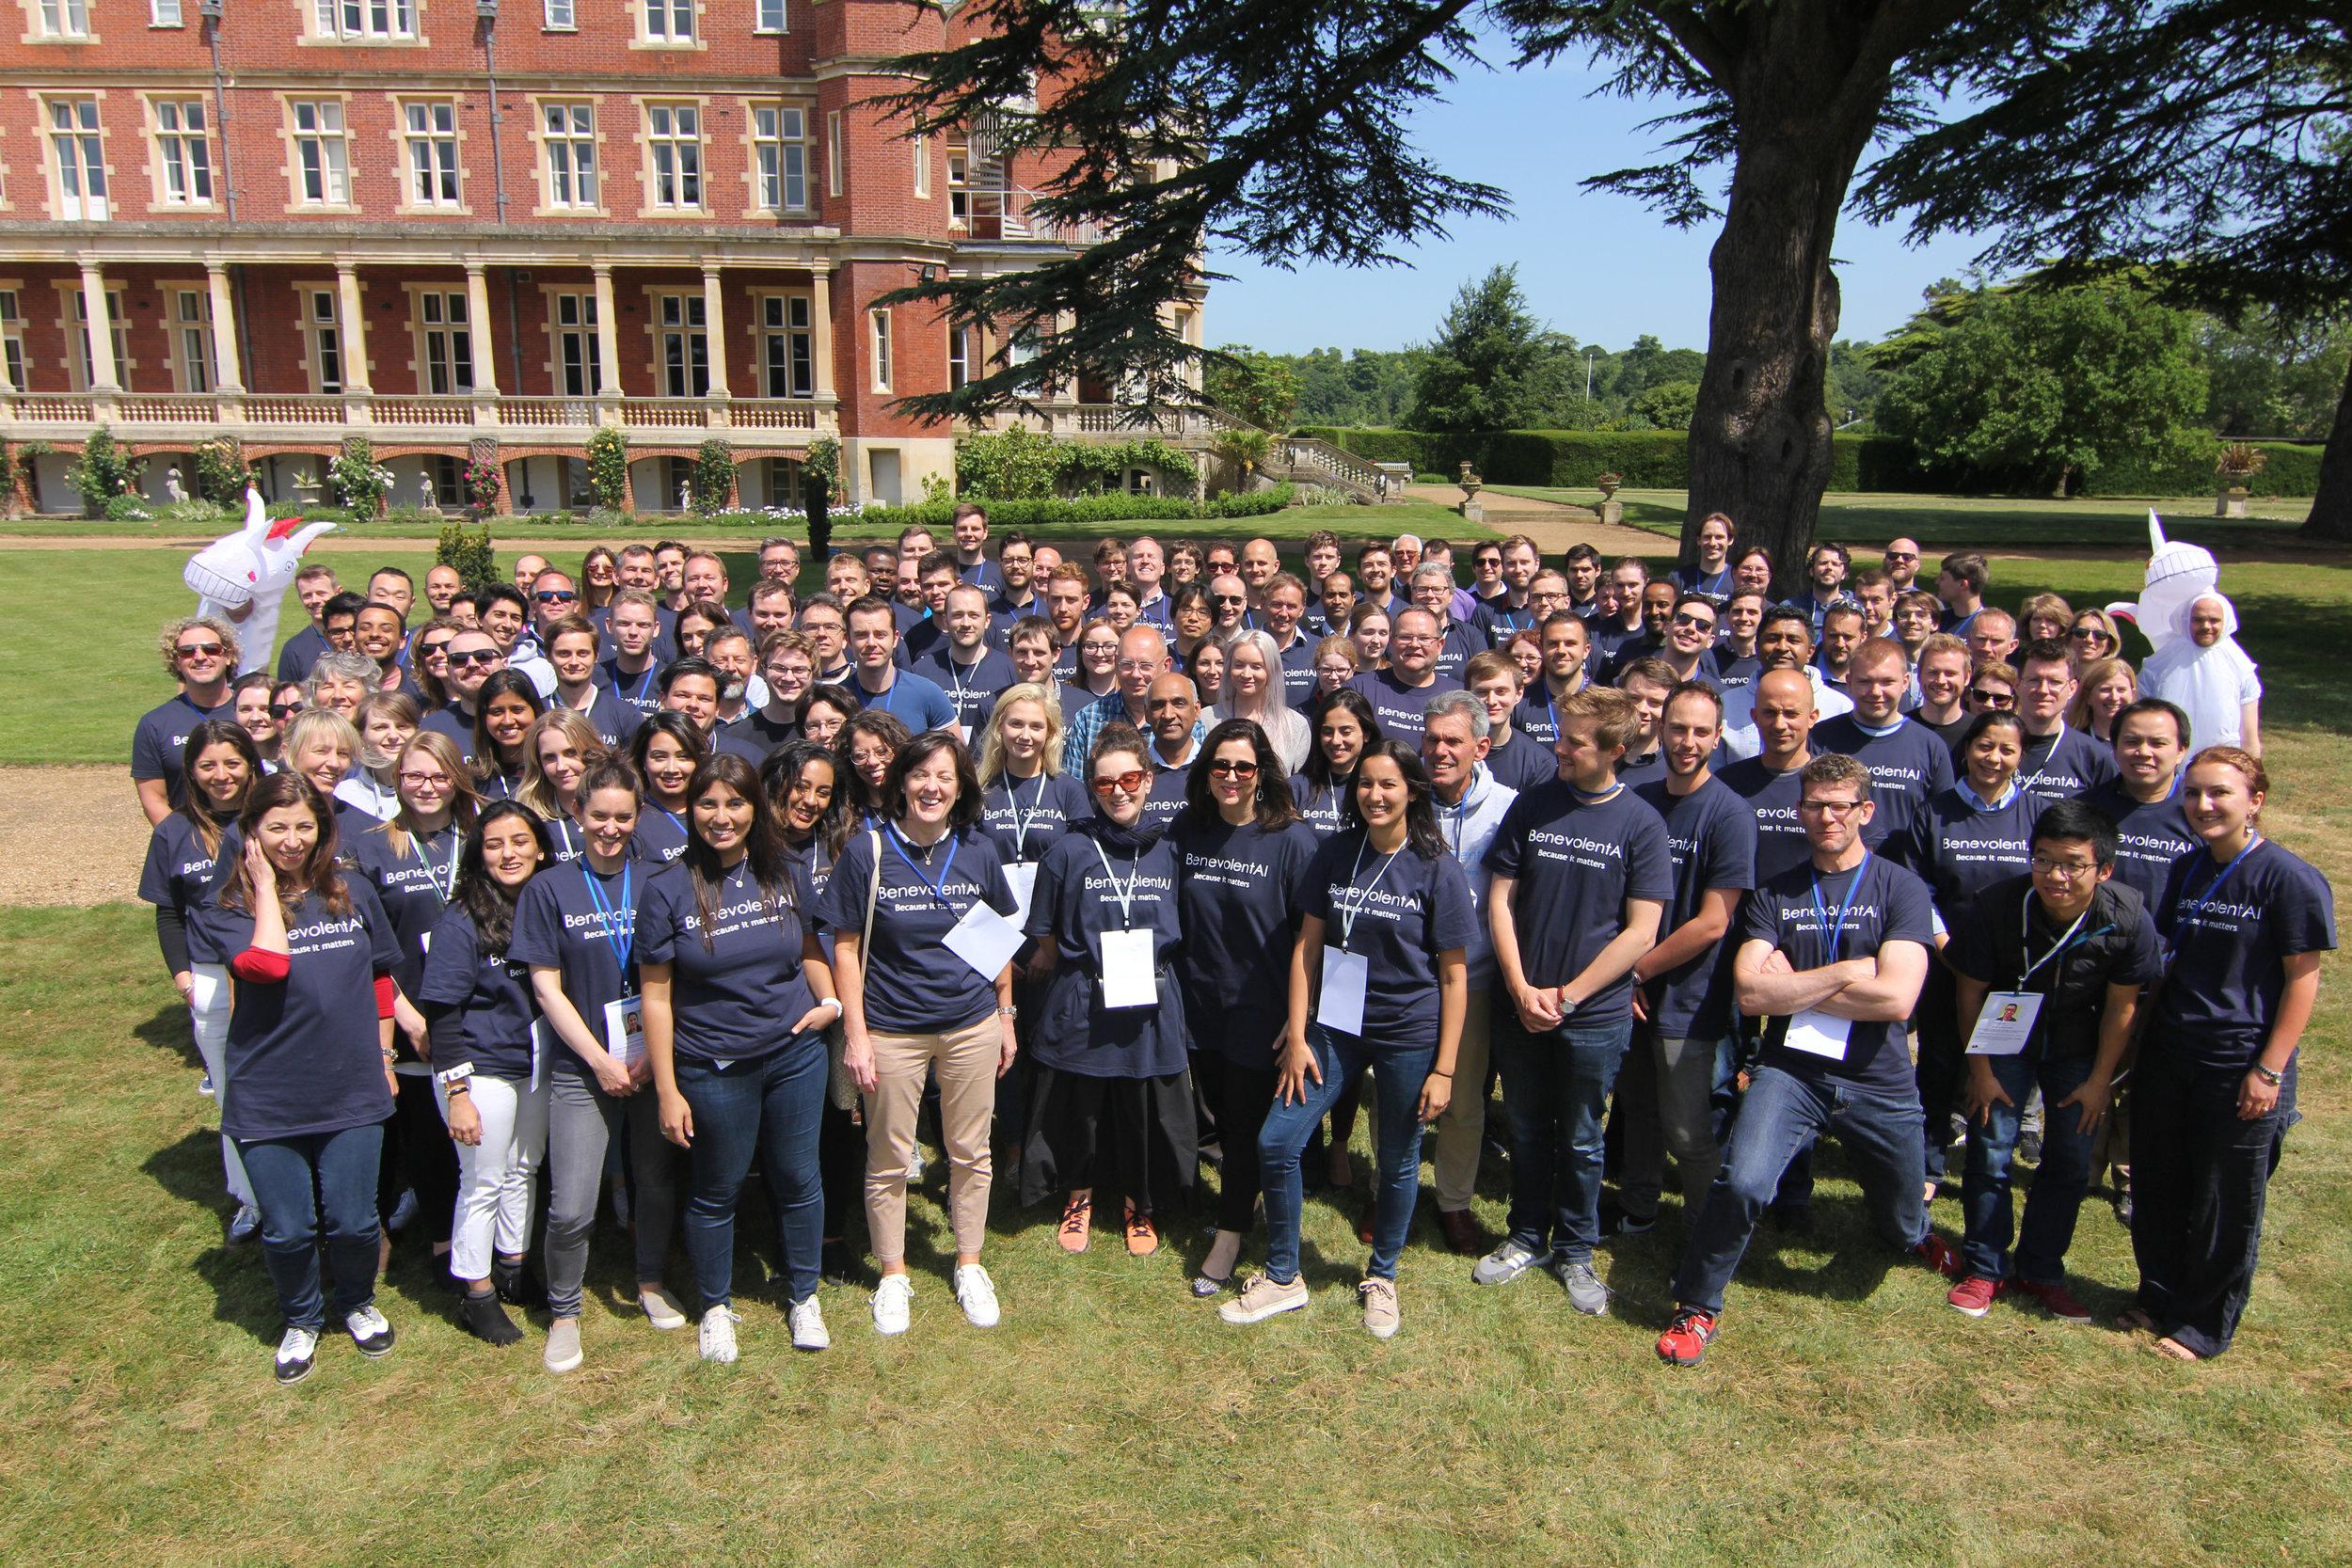 BenevolentAI Group picture.jpg